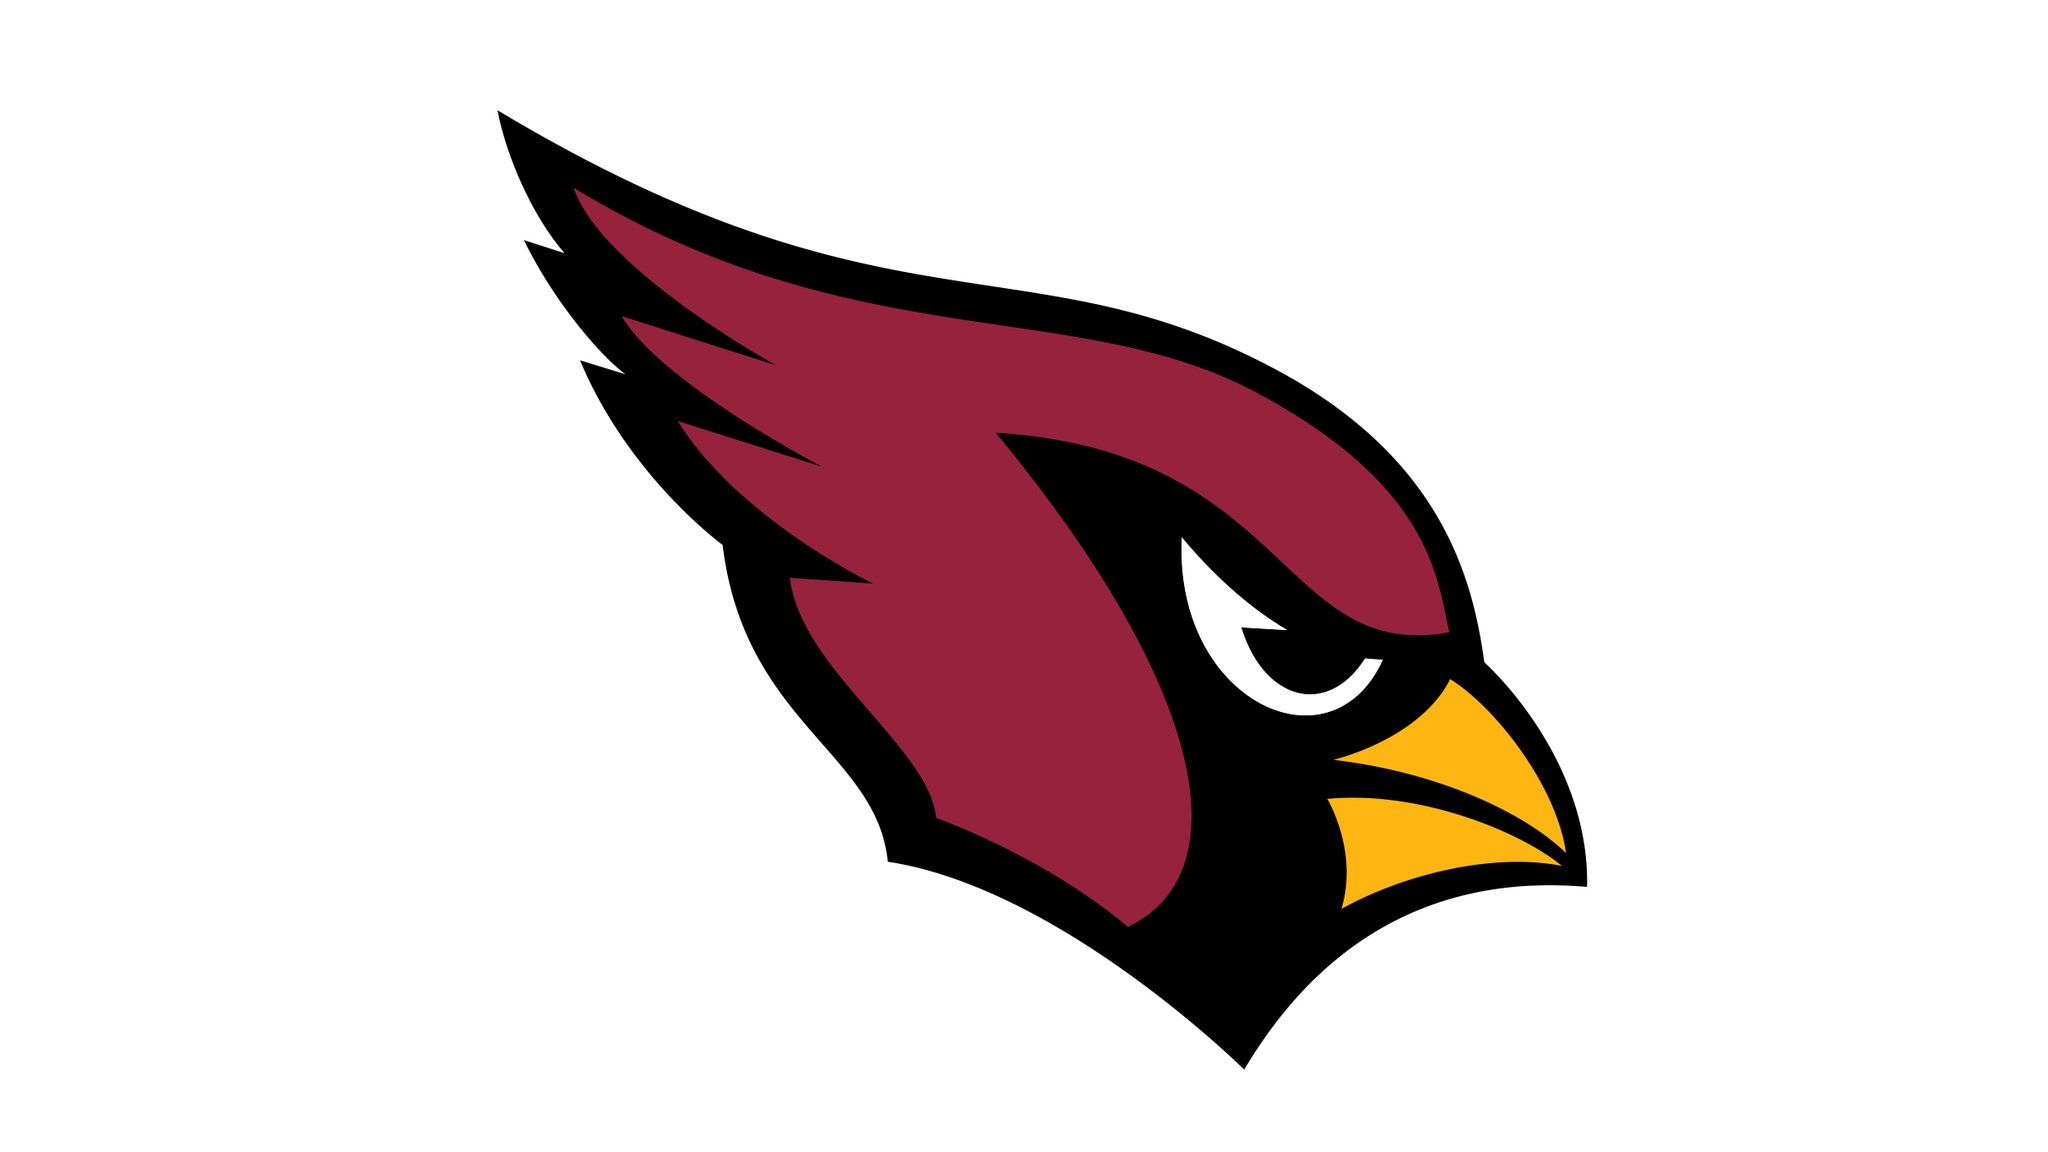 Arizona vs seattle seahawks. Cardinal clipart az cardinals